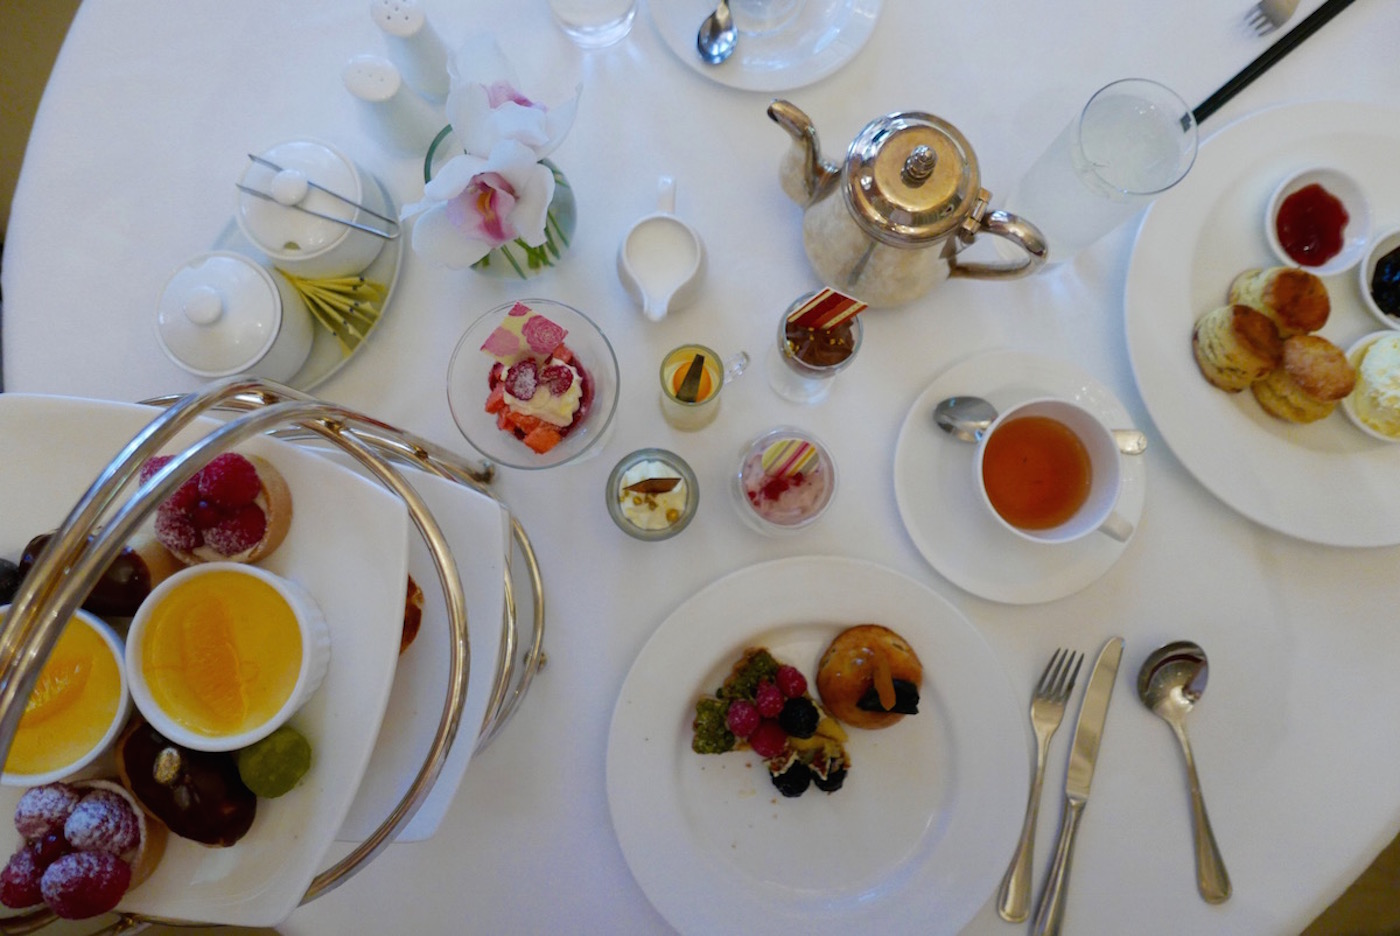 st-regis-singapore-luxury-hotel-review-34